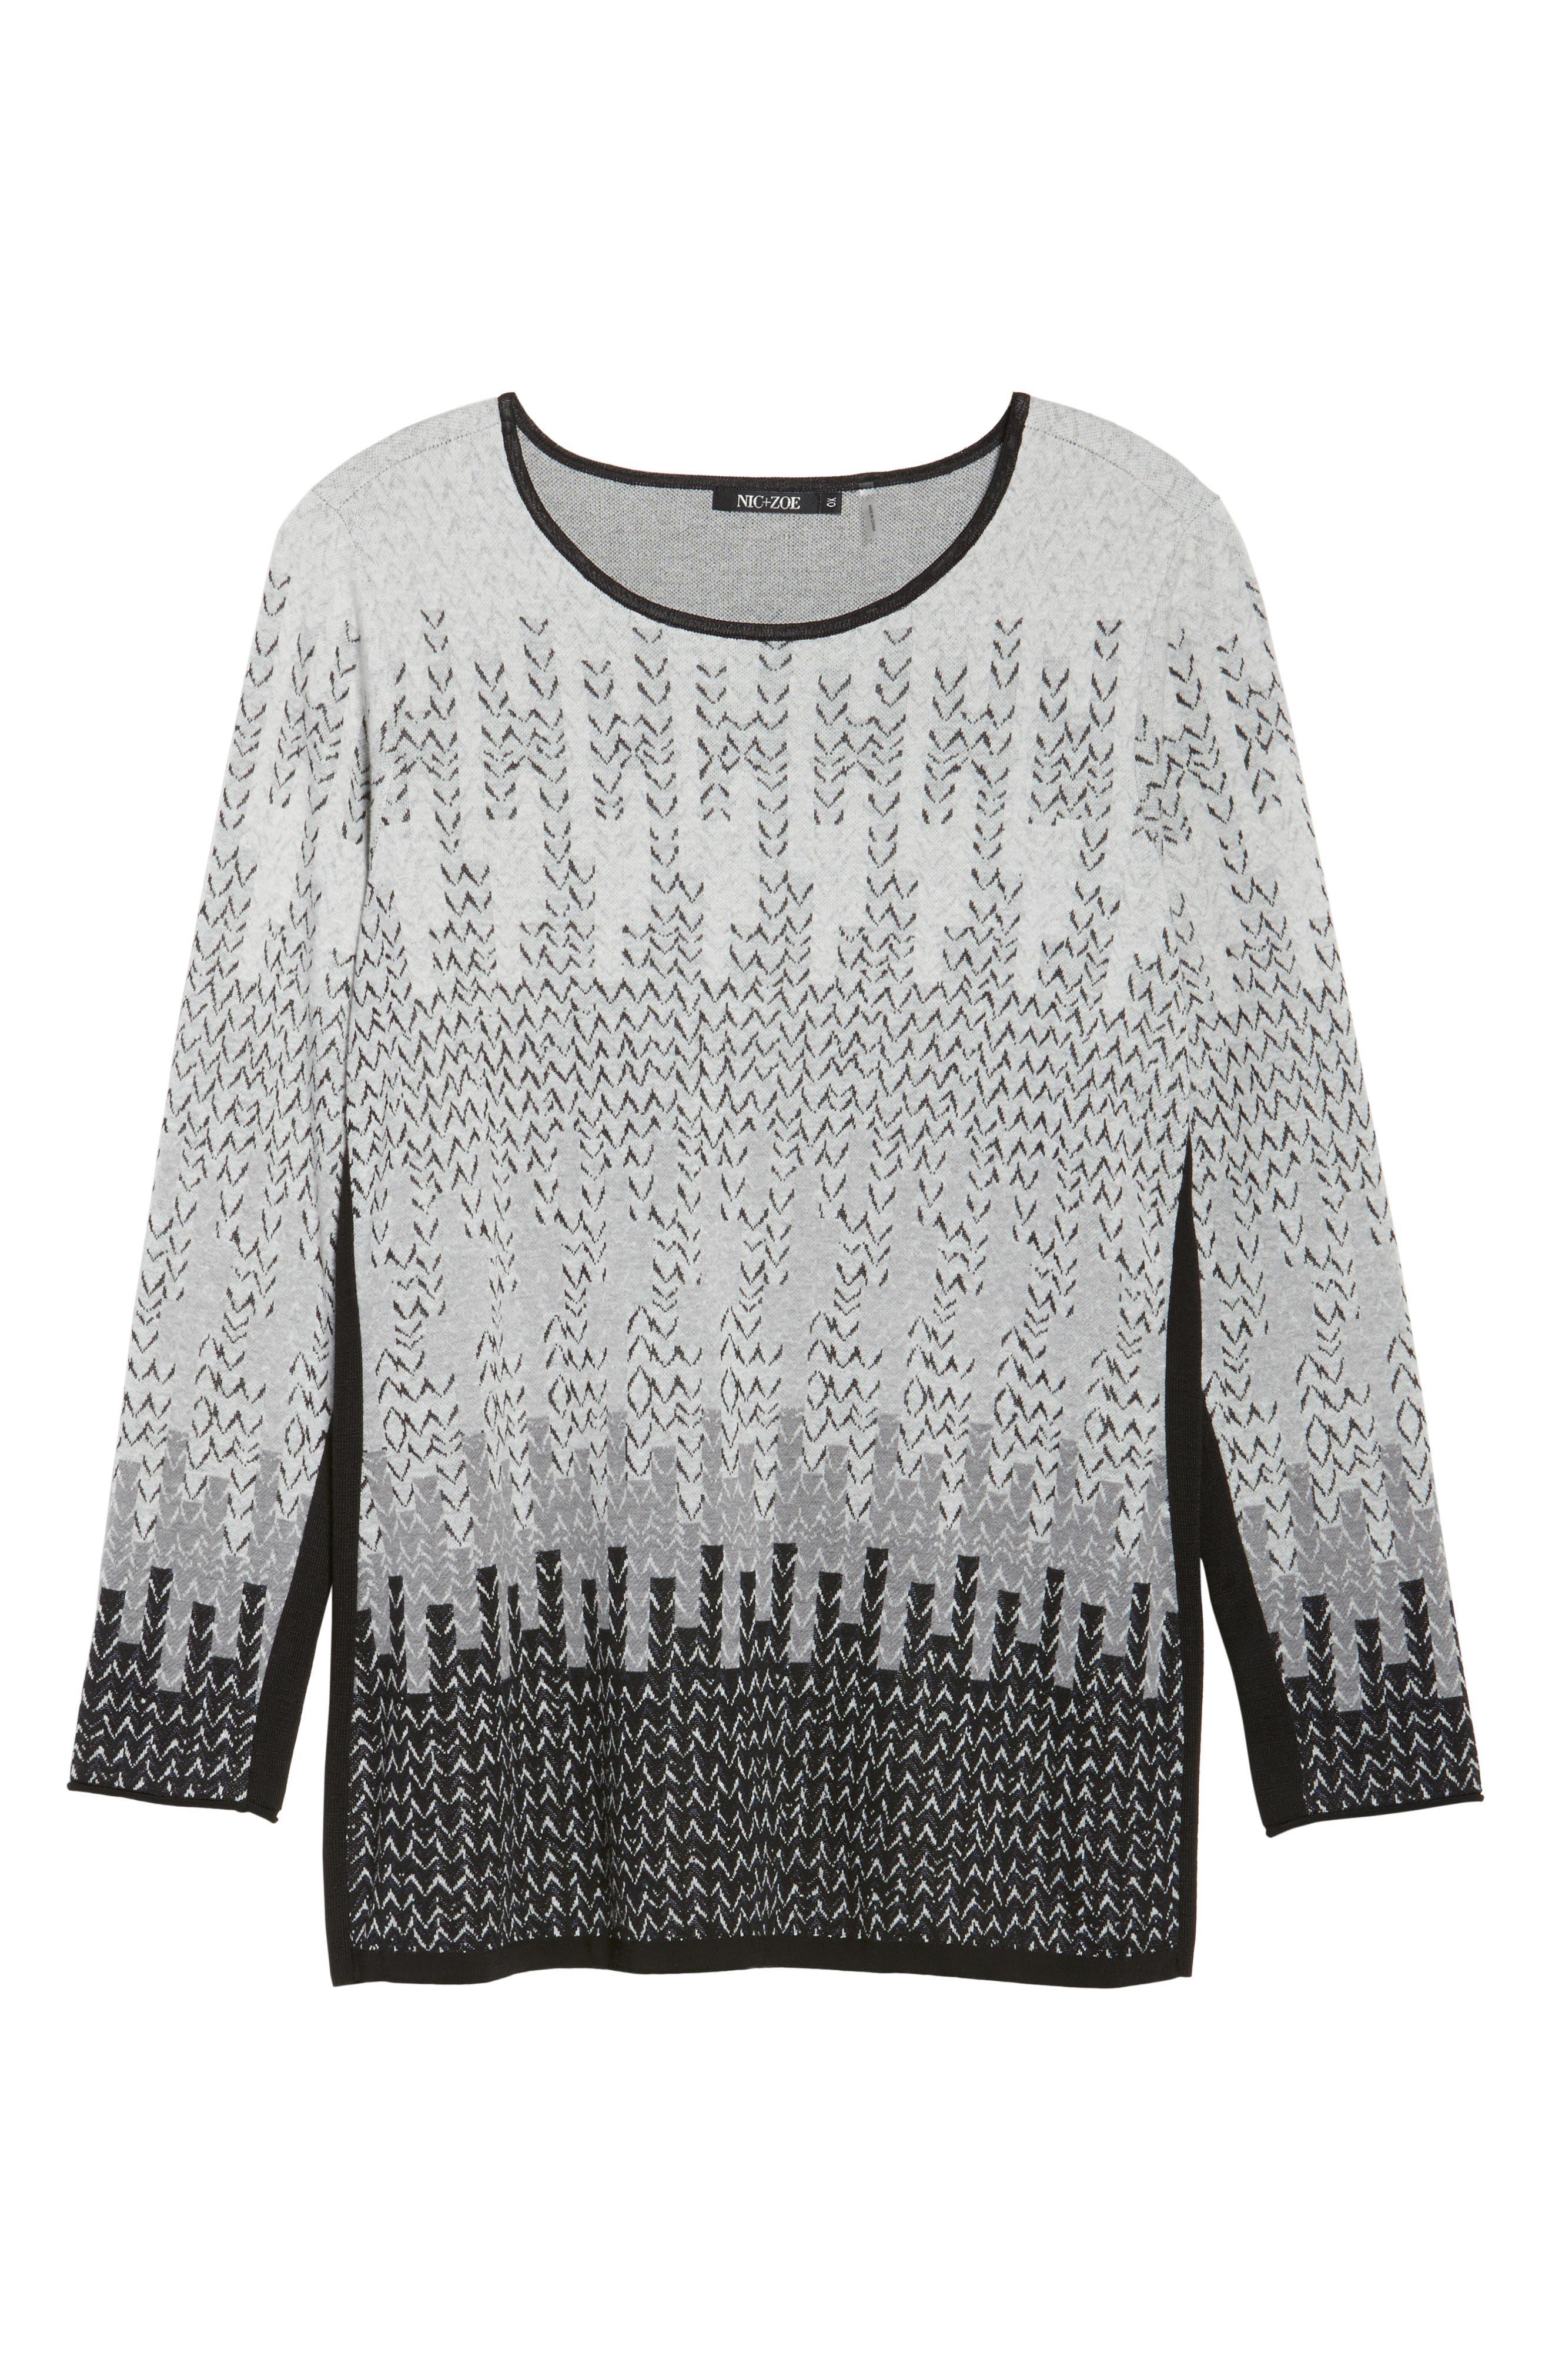 Sunset Sweater,                             Alternate thumbnail 11, color,